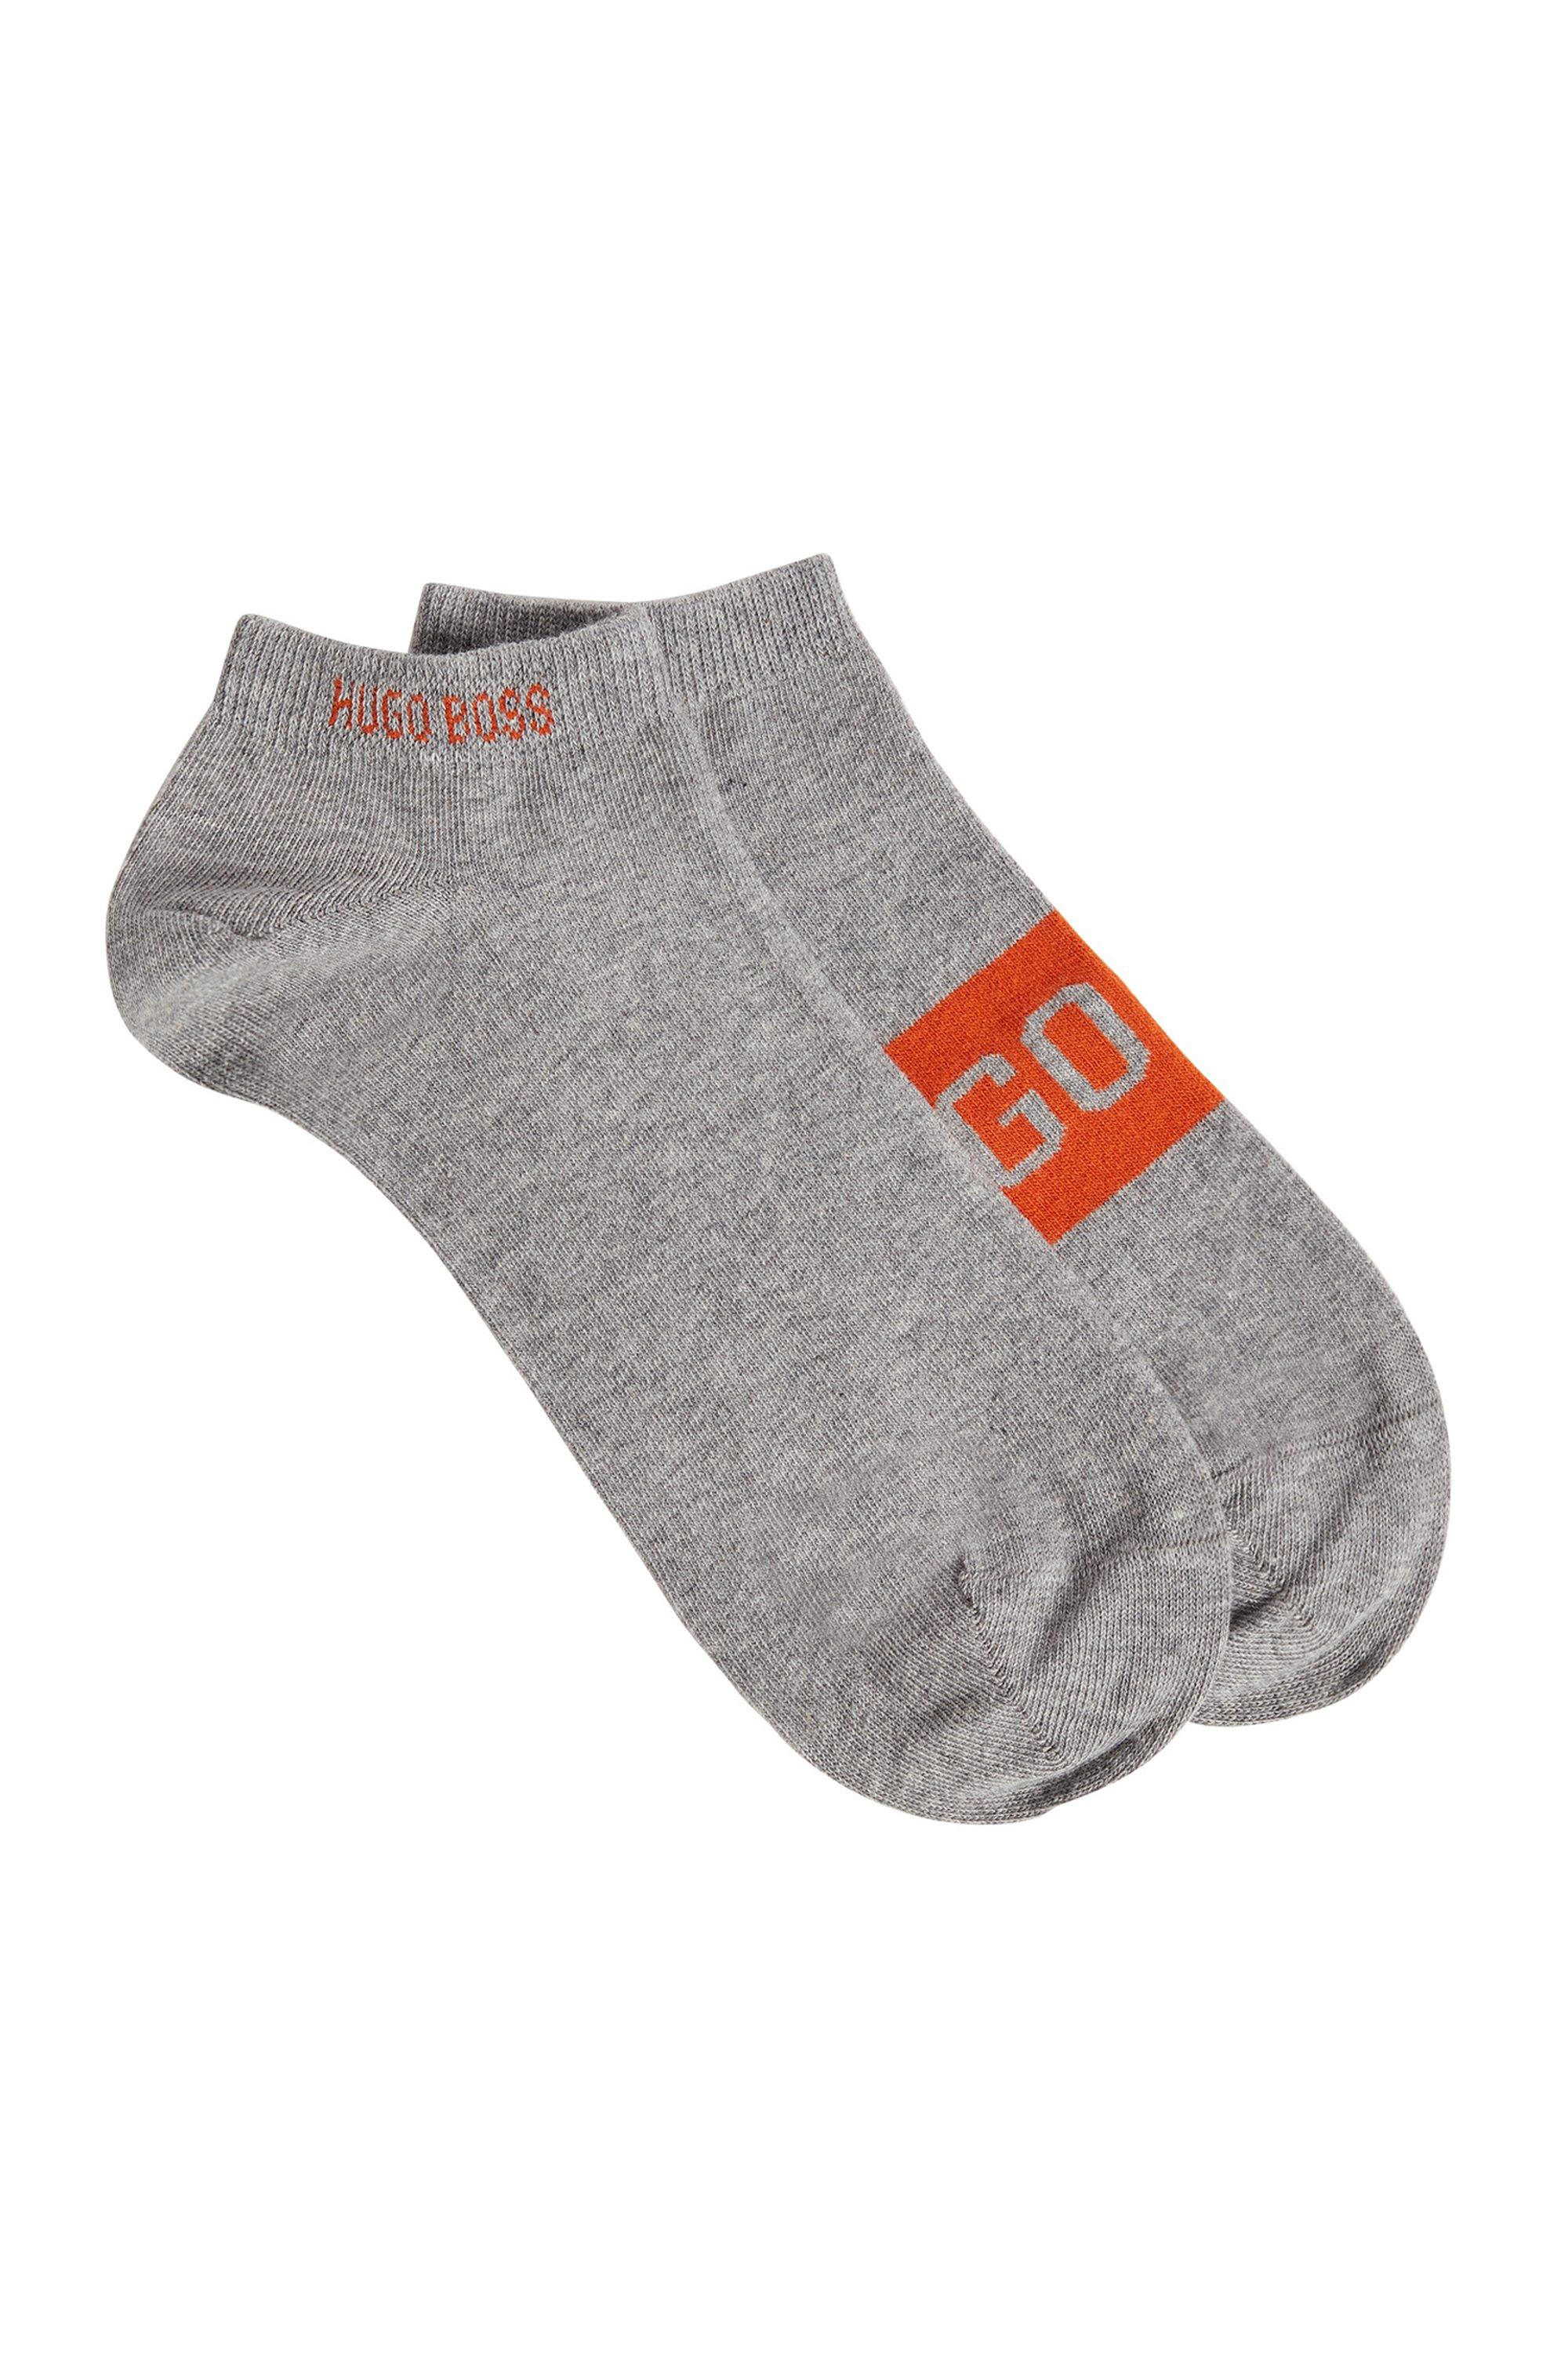 Zweier-Pack Sneakers-Socken mit kontrastfarbenen Logo-Details, Silber